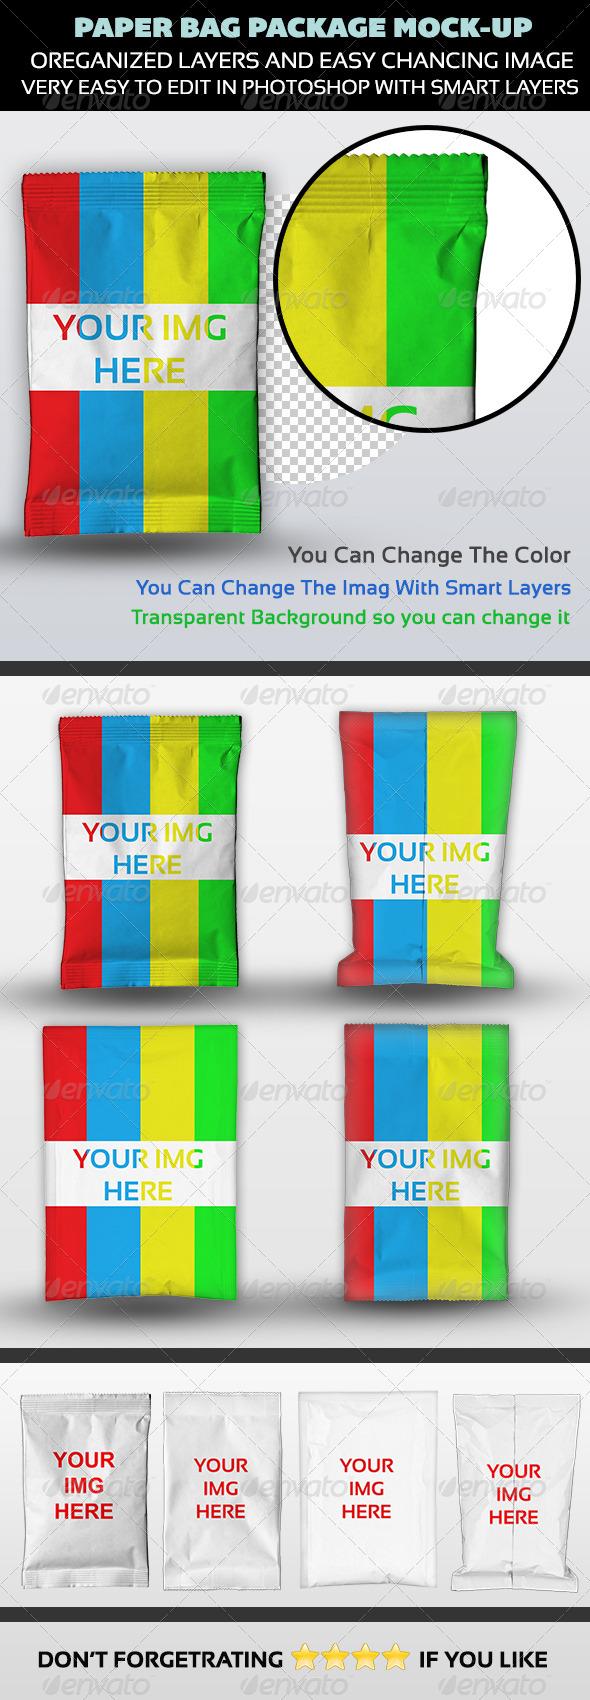 GraphicRiver Paper Bag Package Mock-up 5211835